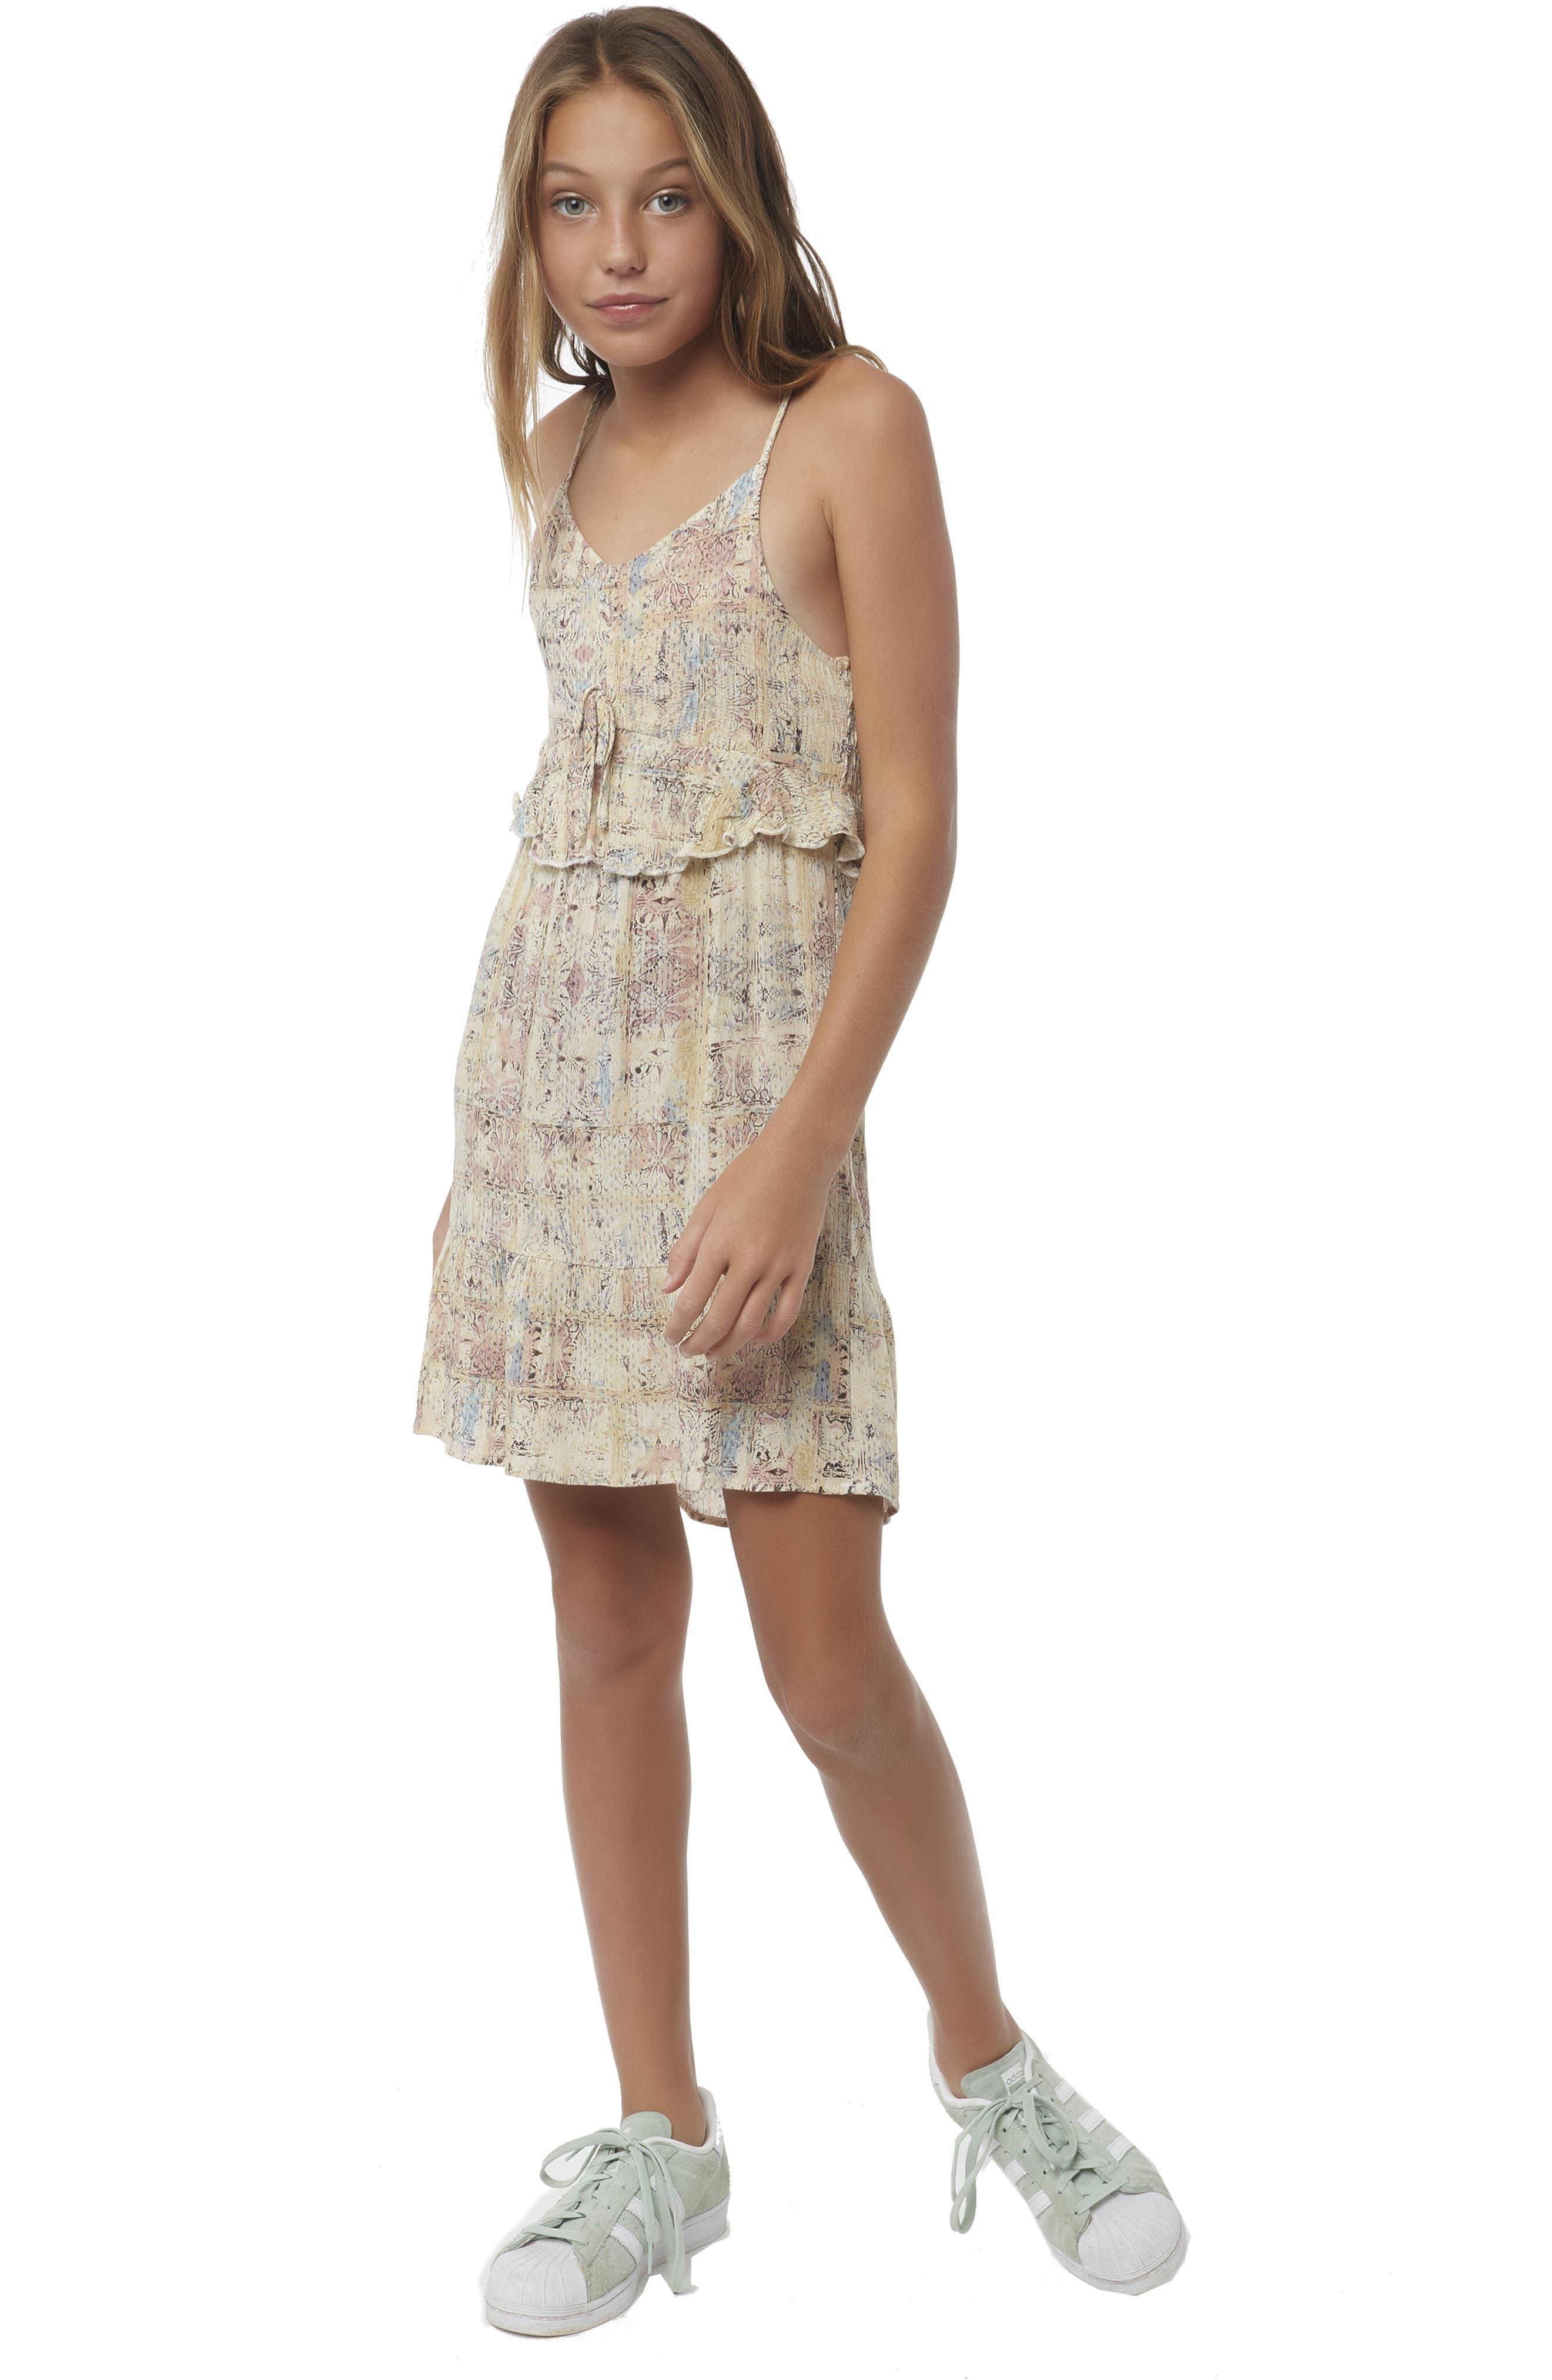 O'NEILL, Lithia Peplum High/Low Dress, Alternate thumbnail 2, color, 994